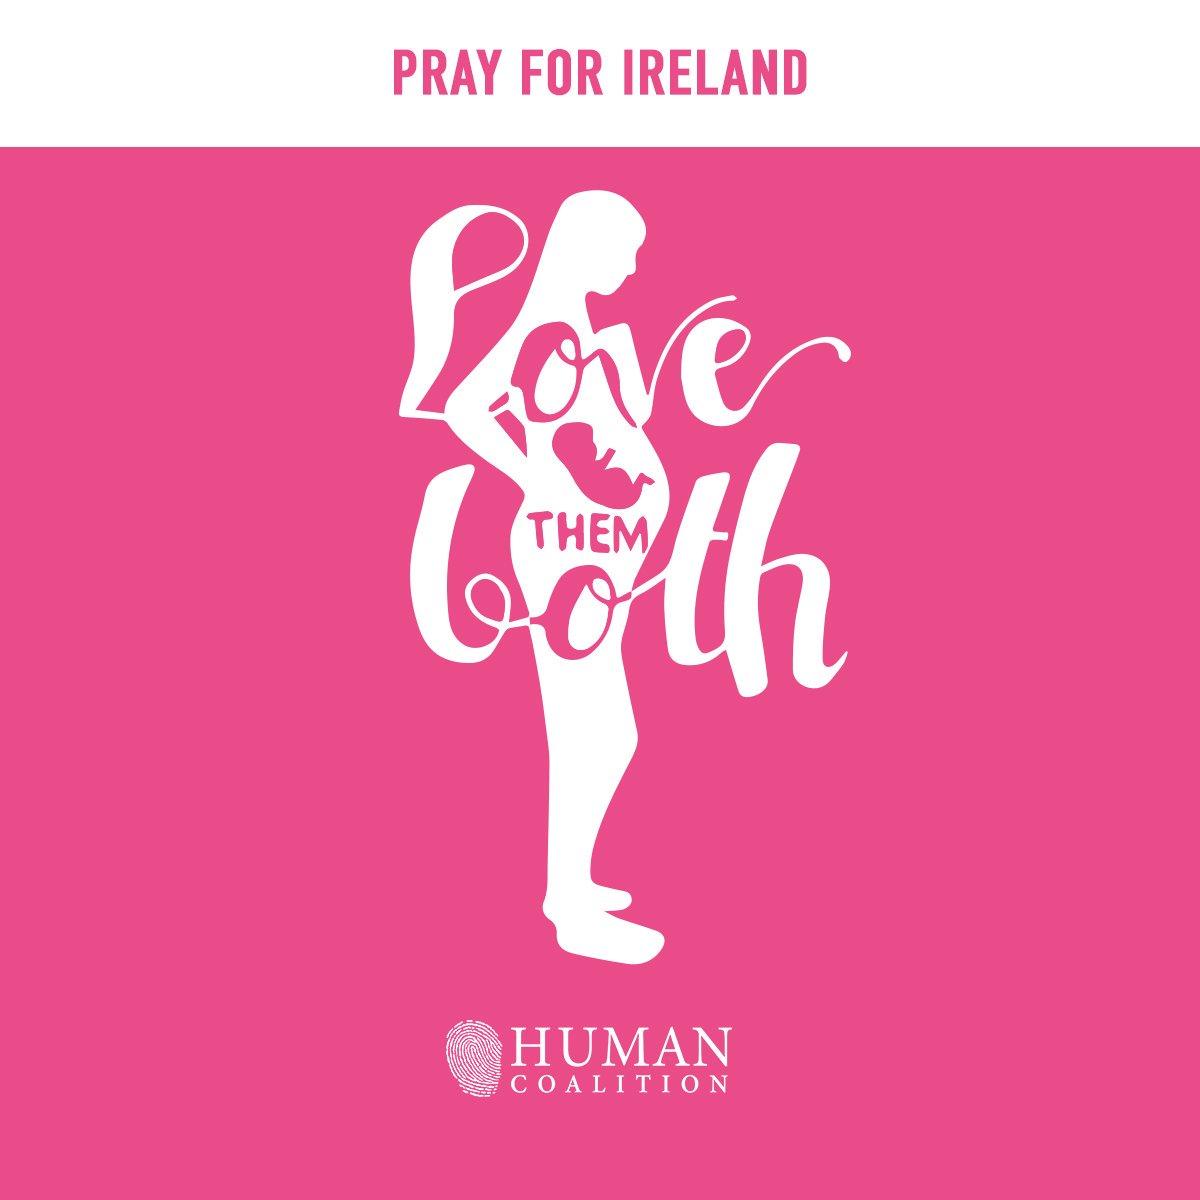 Avortement : l'Irlande encerclée